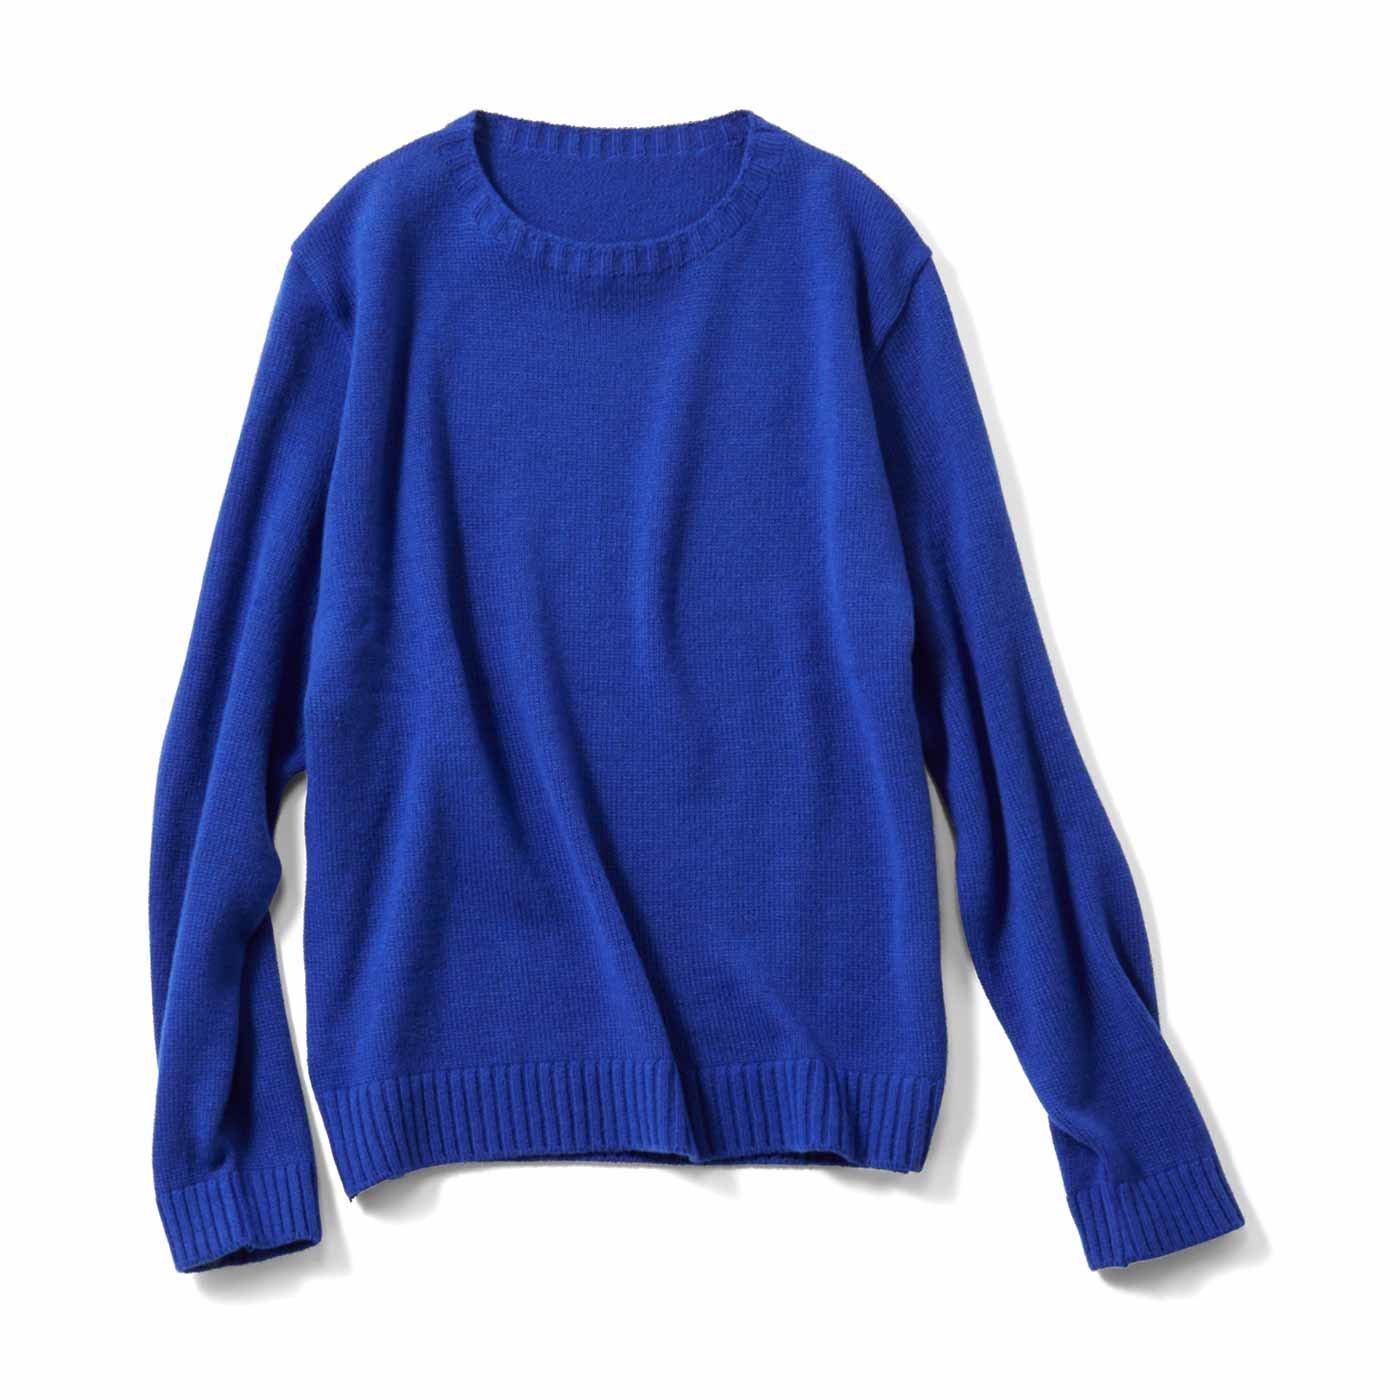 THREE FIFTY STANDARD 気軽なカラーセーター〈ブルー〉